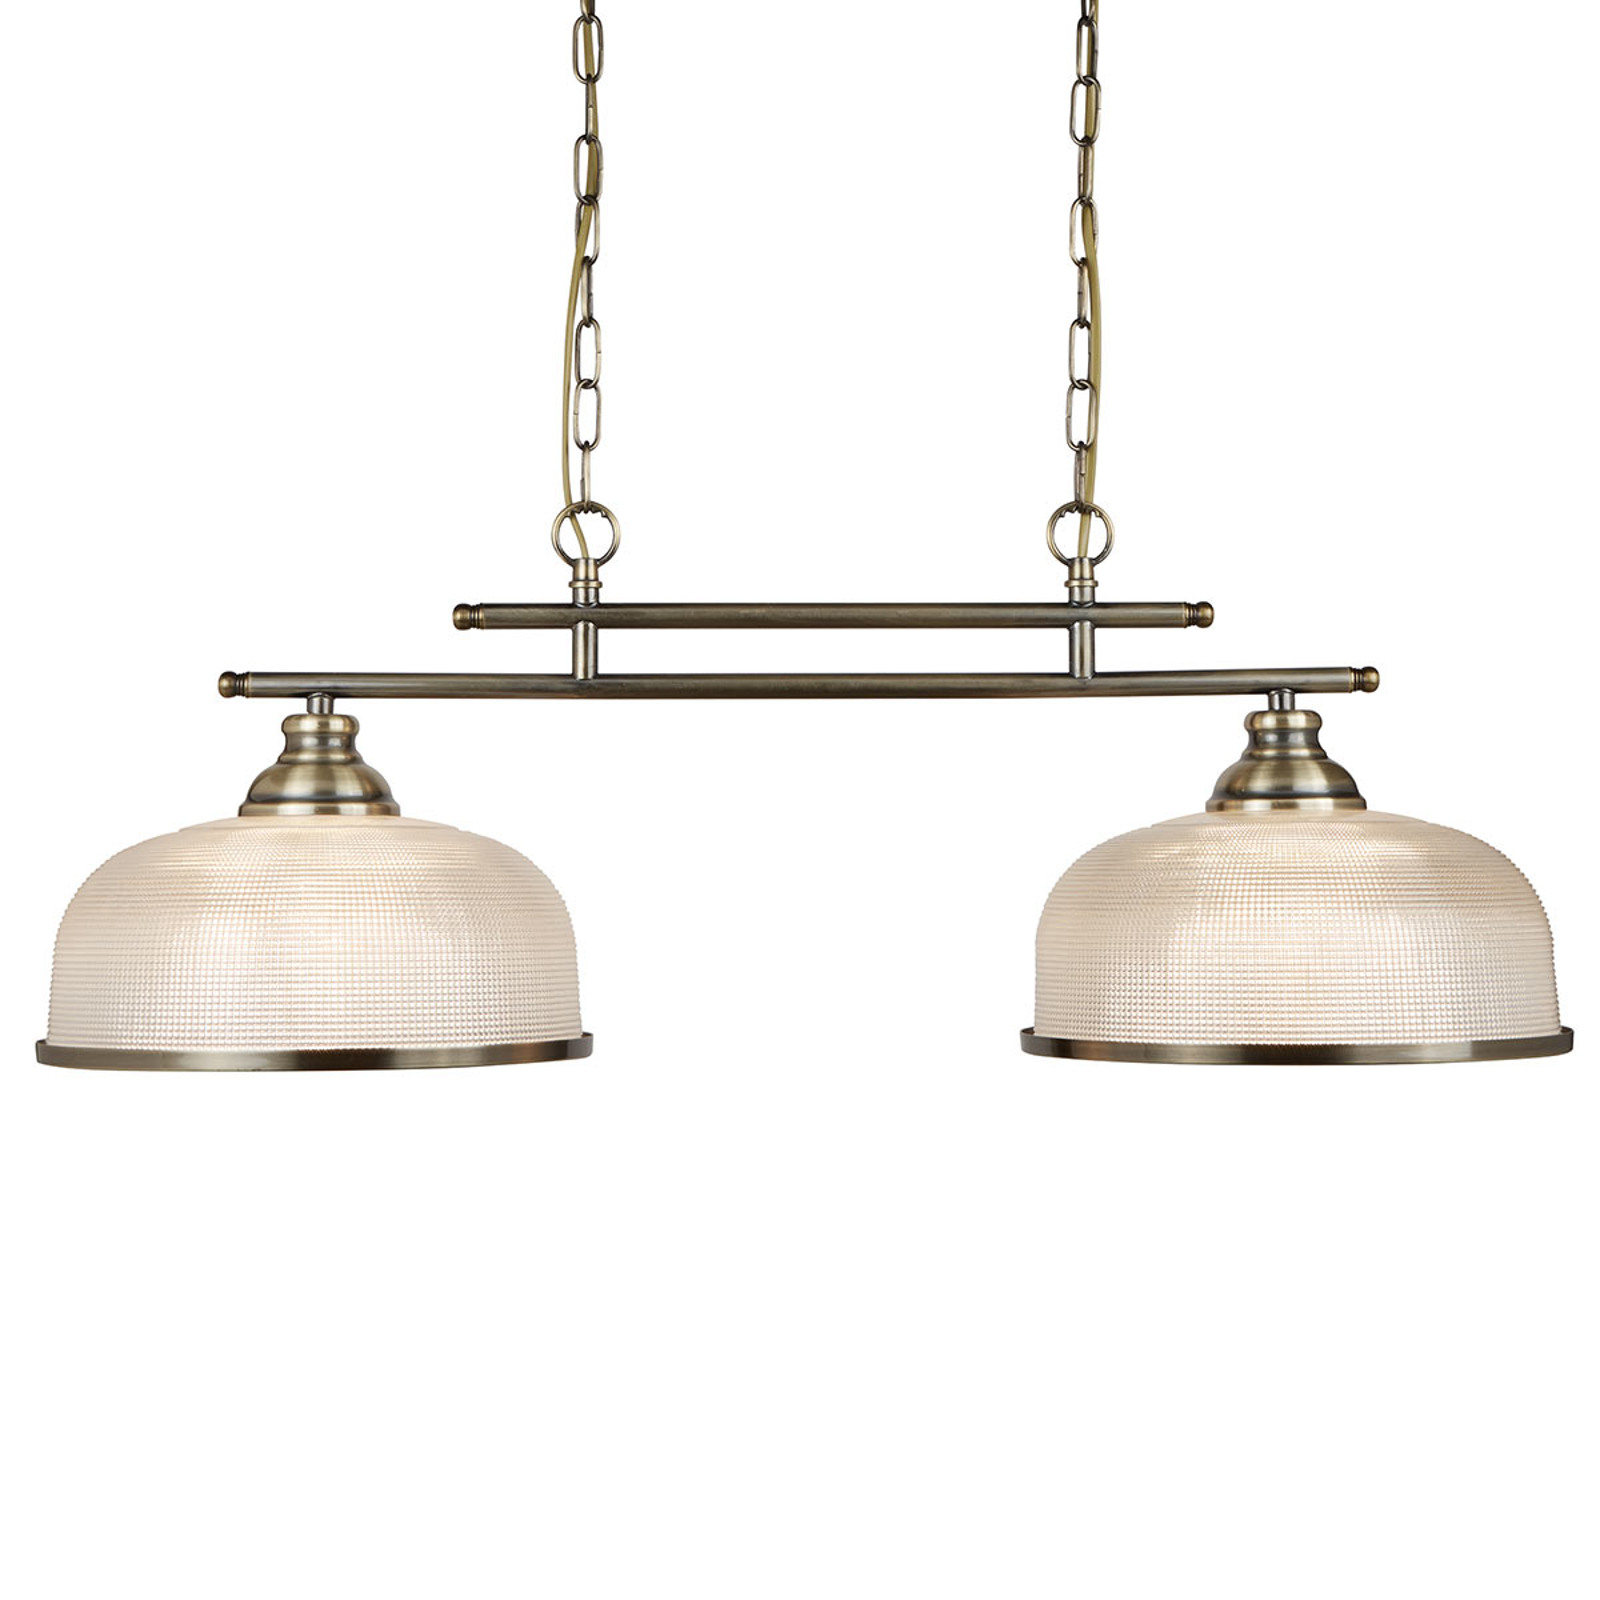 Holophanglas-hanglamp Bistro II 2-lamps messing